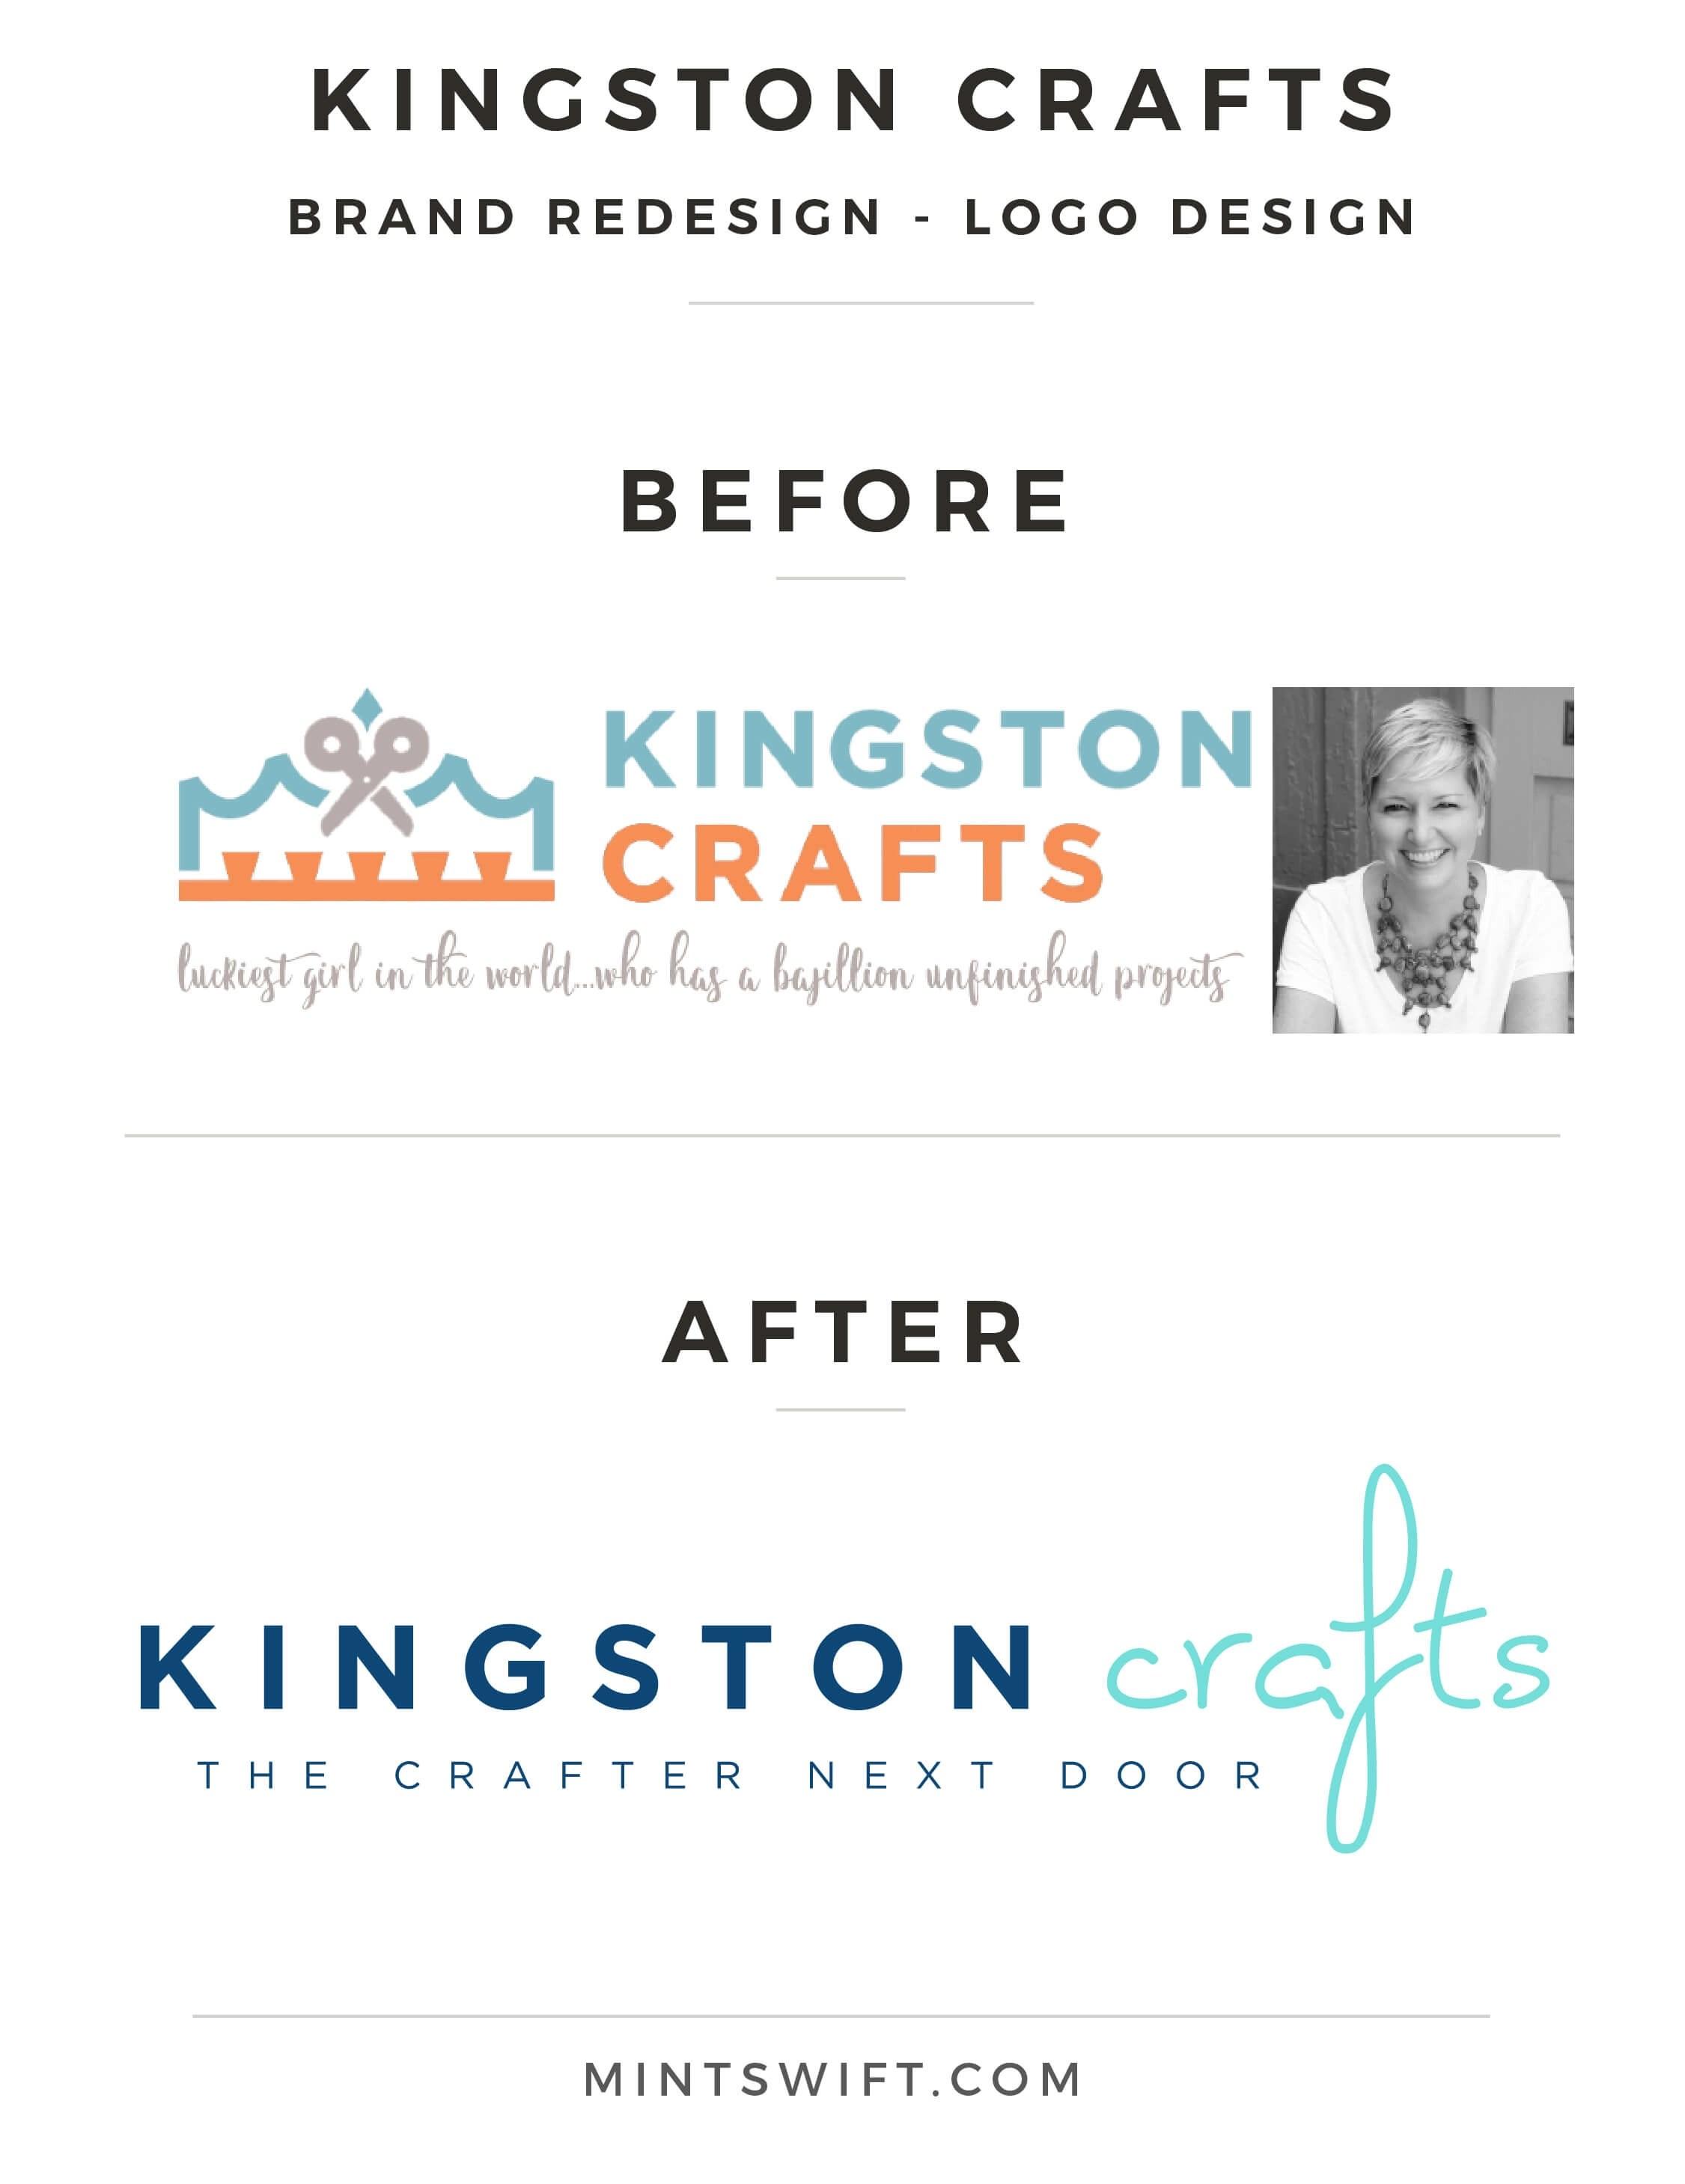 Kingston Crafts Brand Redesign Logo Design - MintSwift